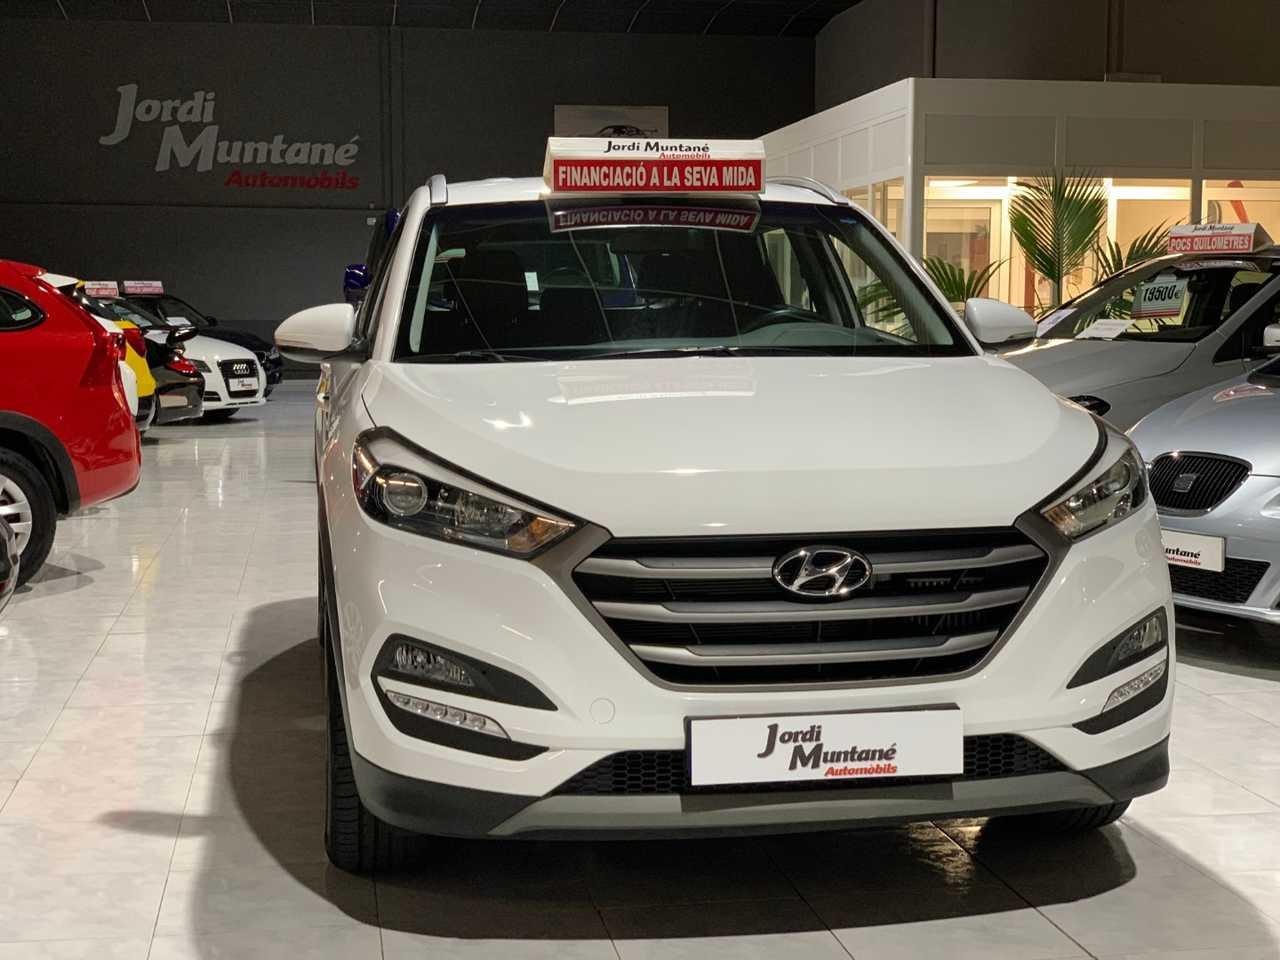 Hyundai Tucson 1.7 CRDI 115cv -. '' Solo 21.525 km '' .- 25 Aniversario -.   - Foto 1